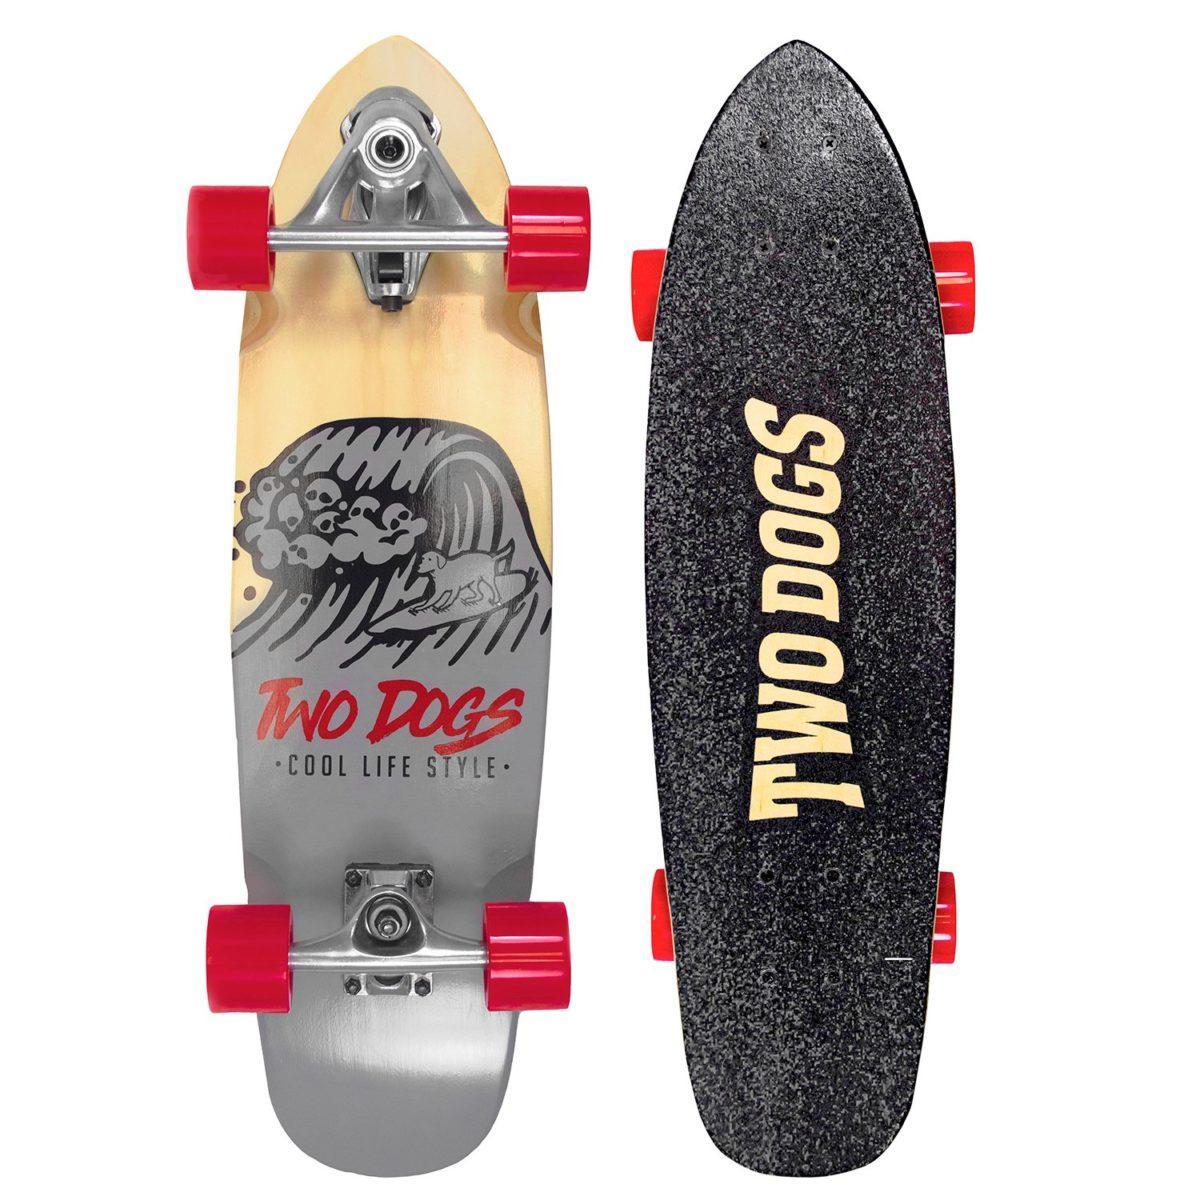 Skate Simulador De Surf Two Dogs - Surf Dog - TD-SS101